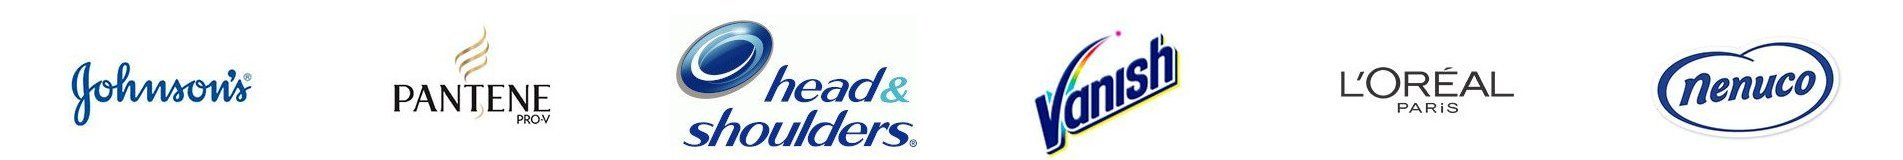 Johnson's Pantene H&S Vanish L'oreal Nenuco